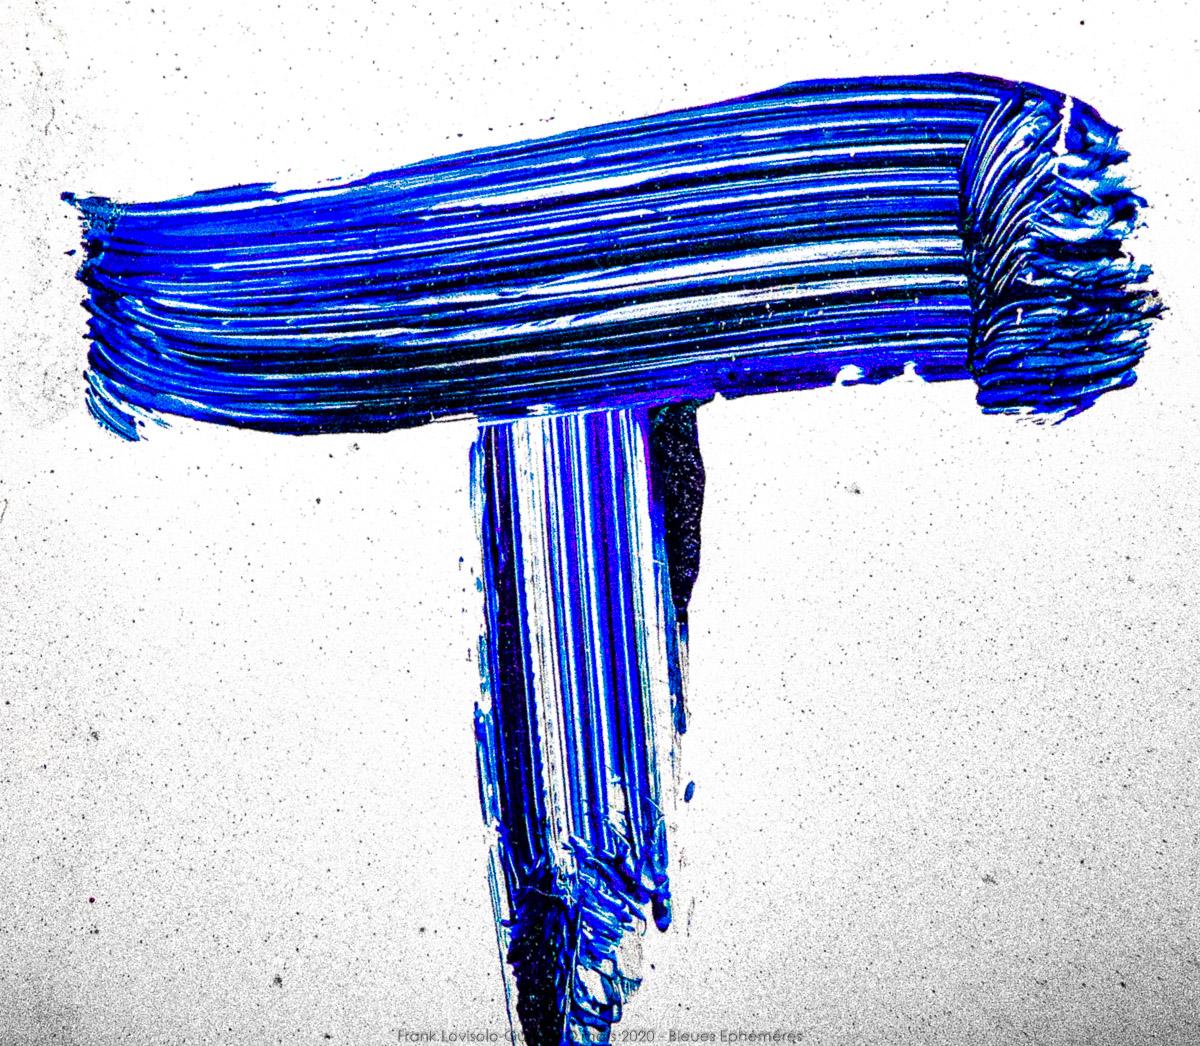 n006 bleues ephemeres frank lovisolo guillard